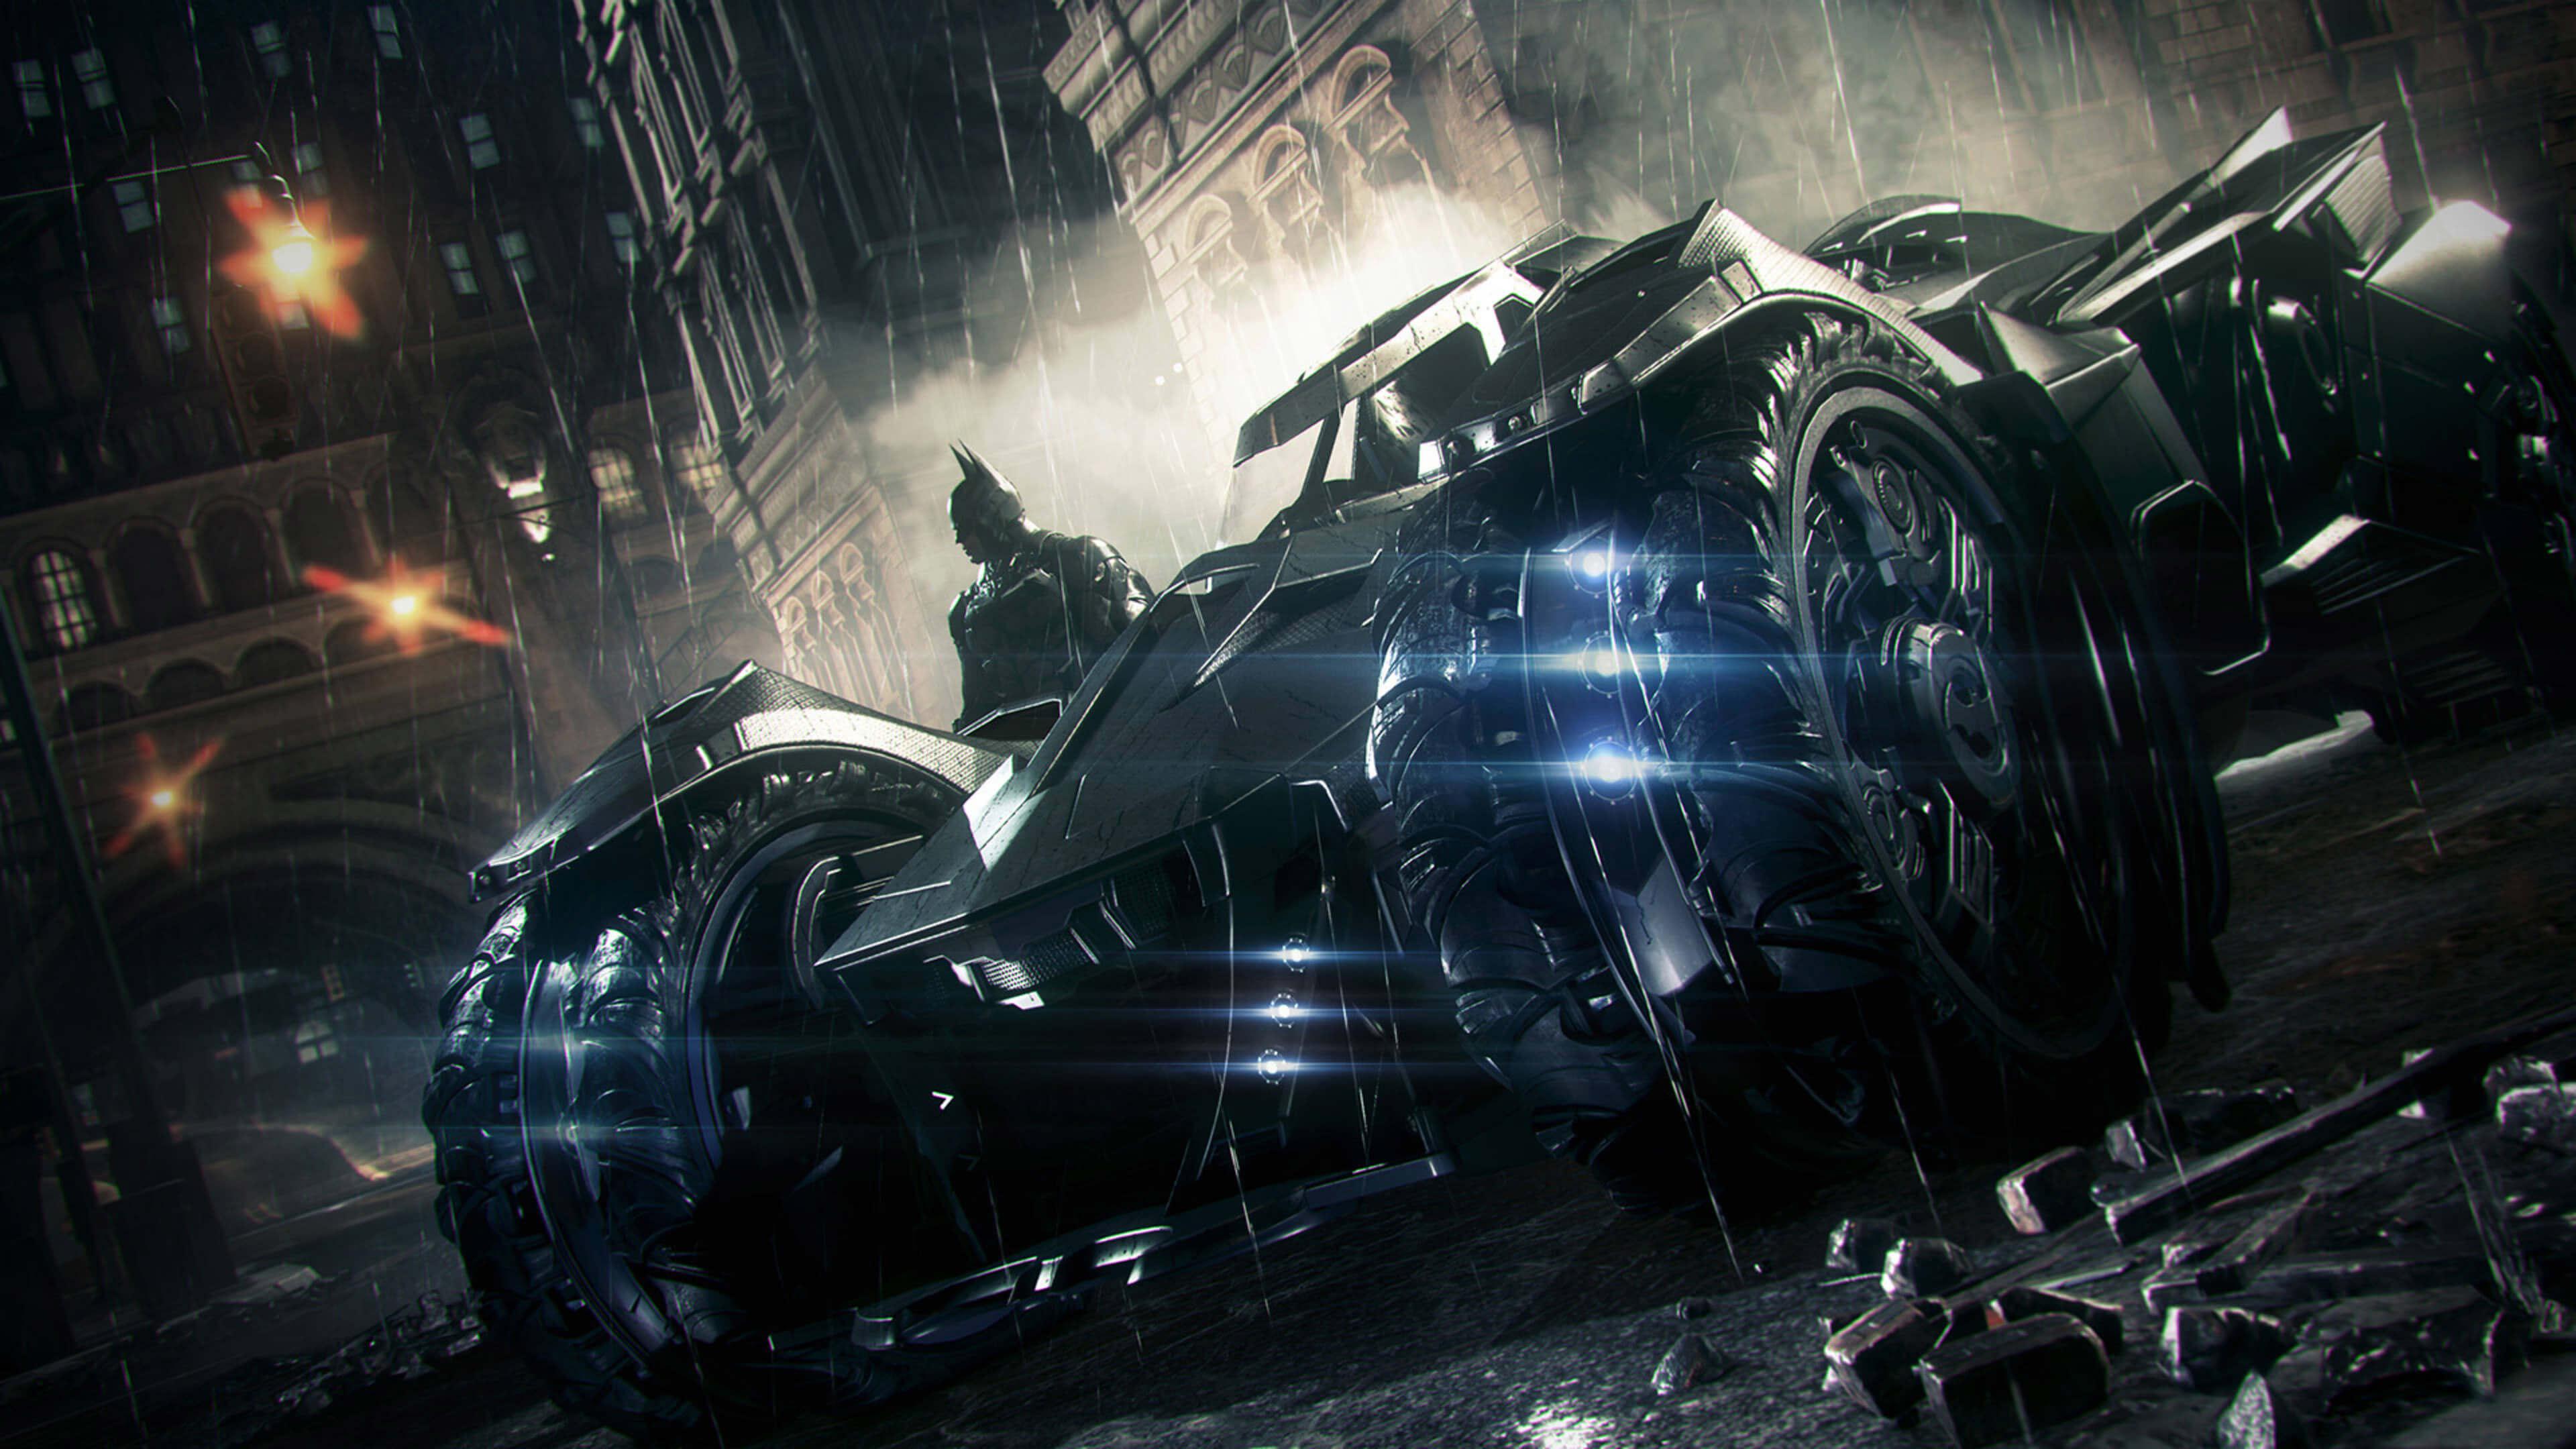 Batmobile Batman Arkham Knight 4k Wallpaper